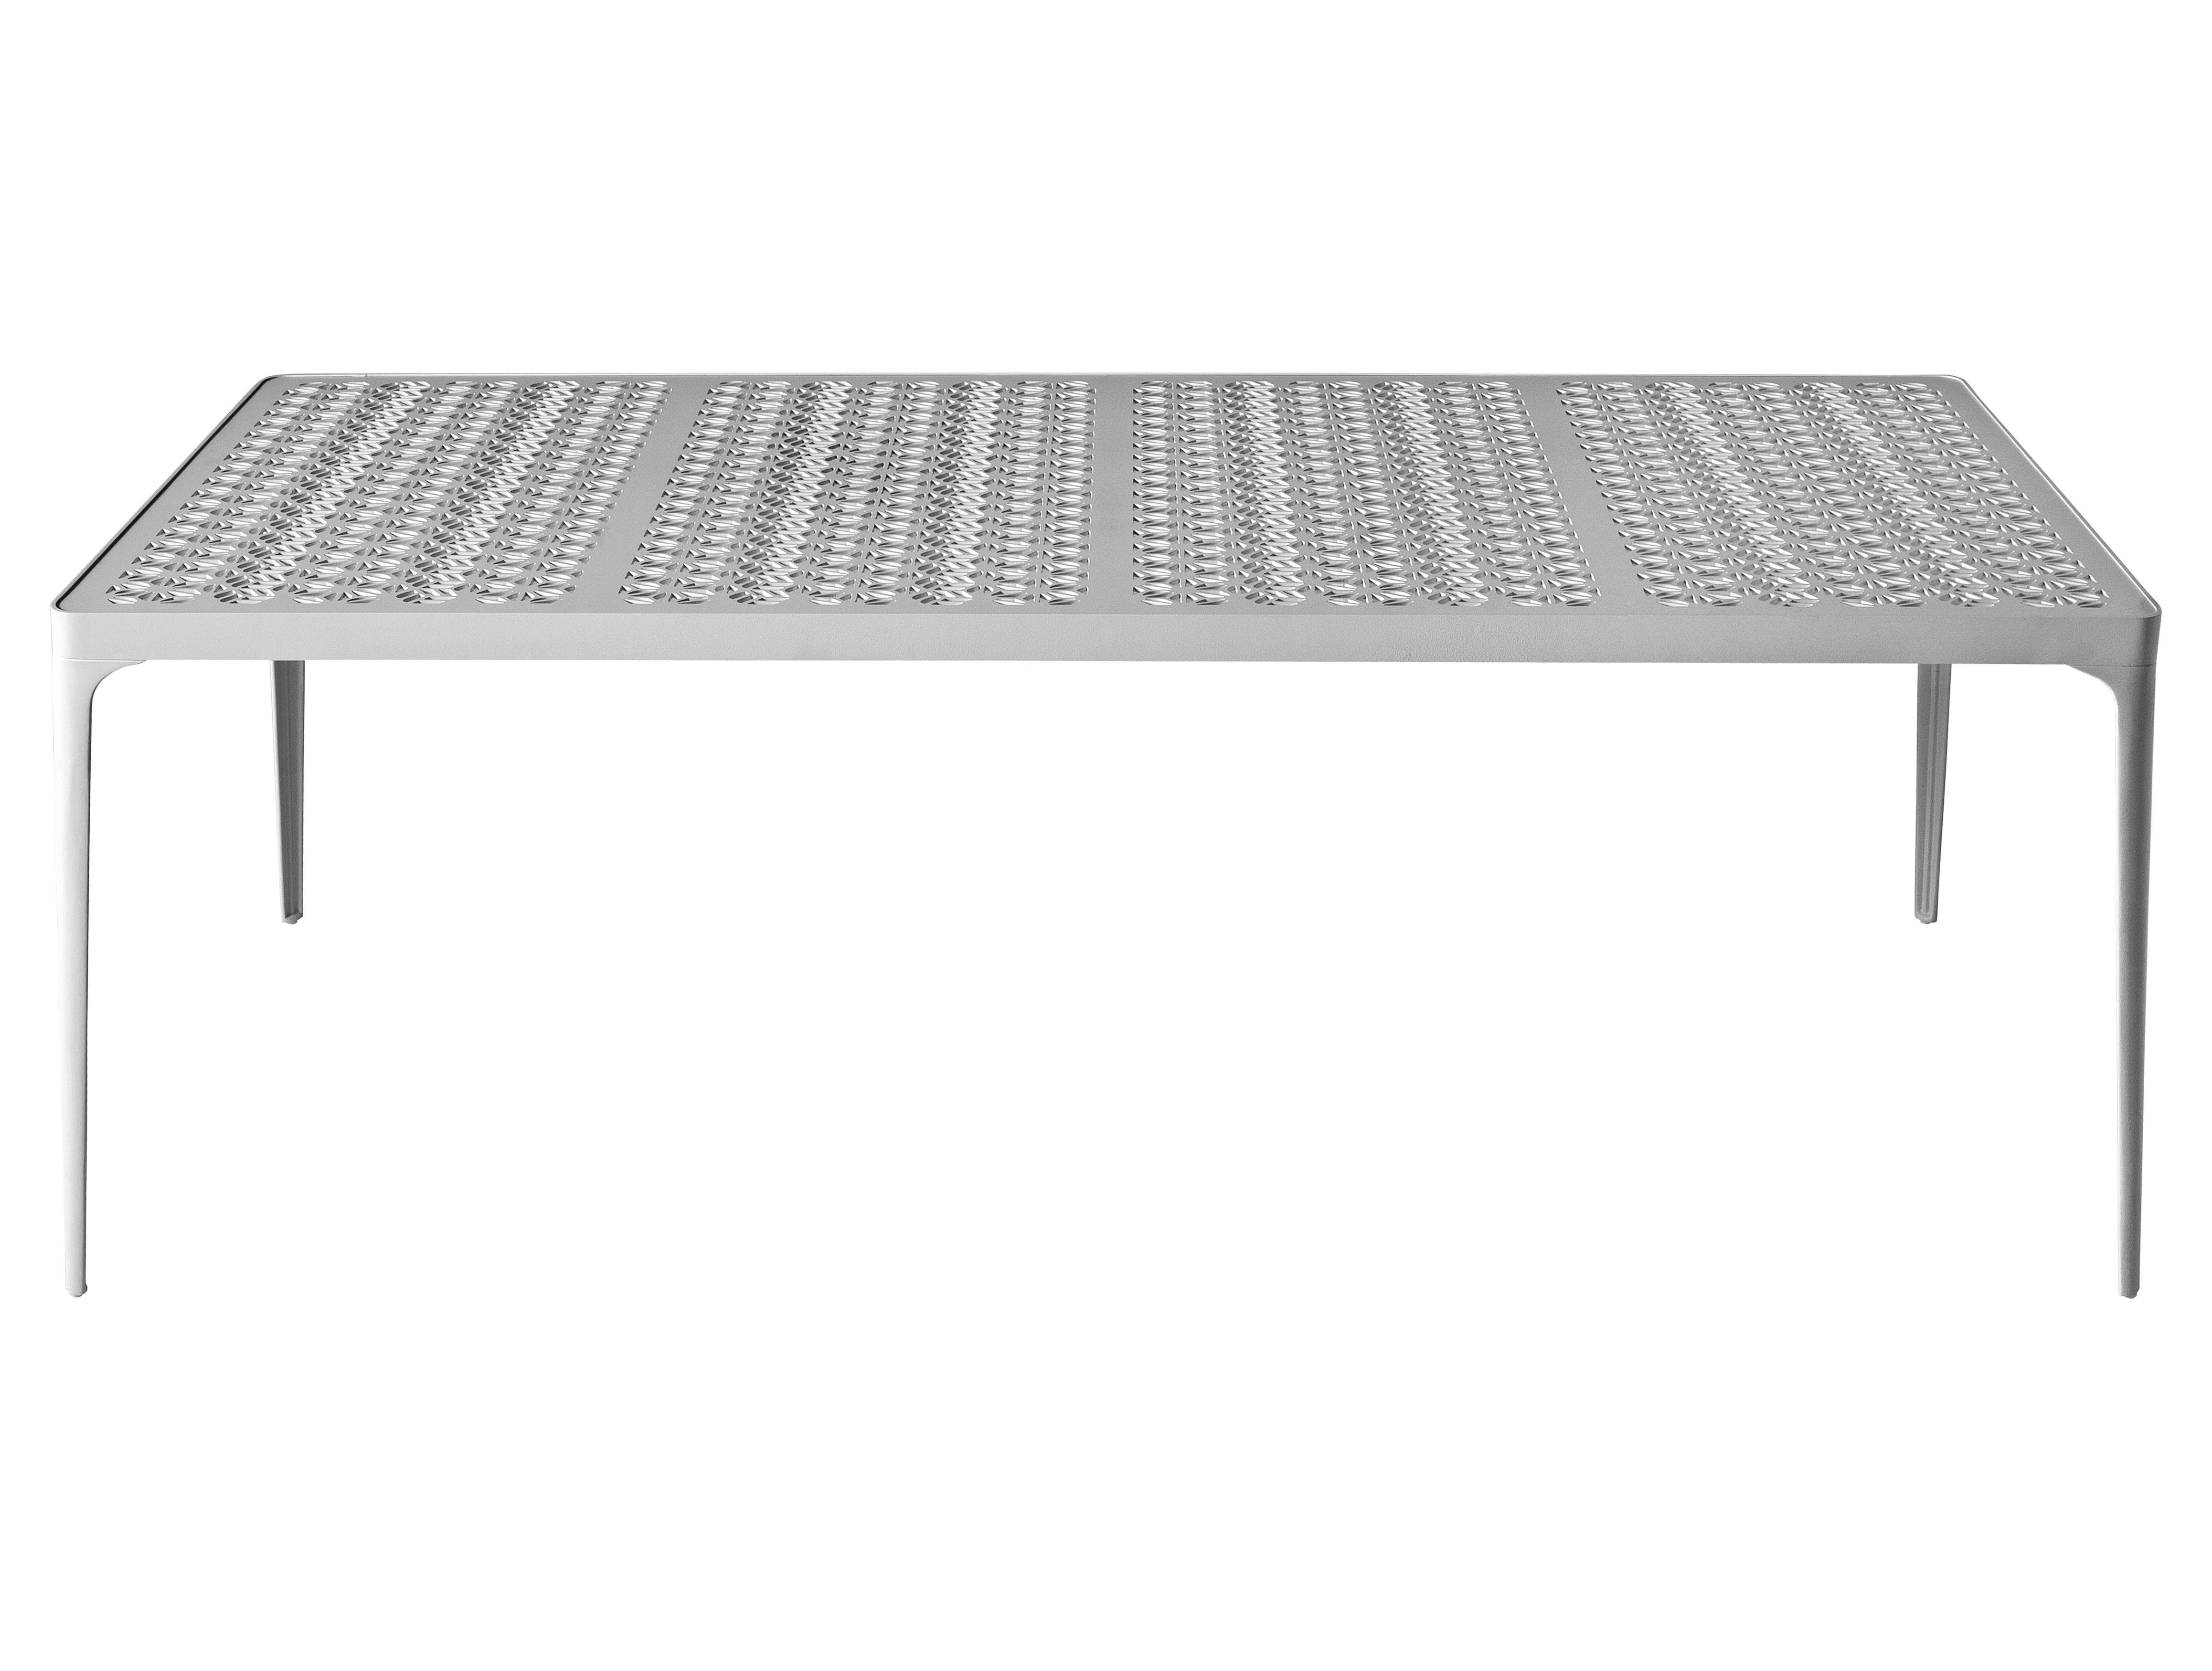 Outdoor - Garden Tables - Sunrise Rectangular table - 200 x 80 cm by Driade - White - 200 x 80 cm - Lacquered aluminium